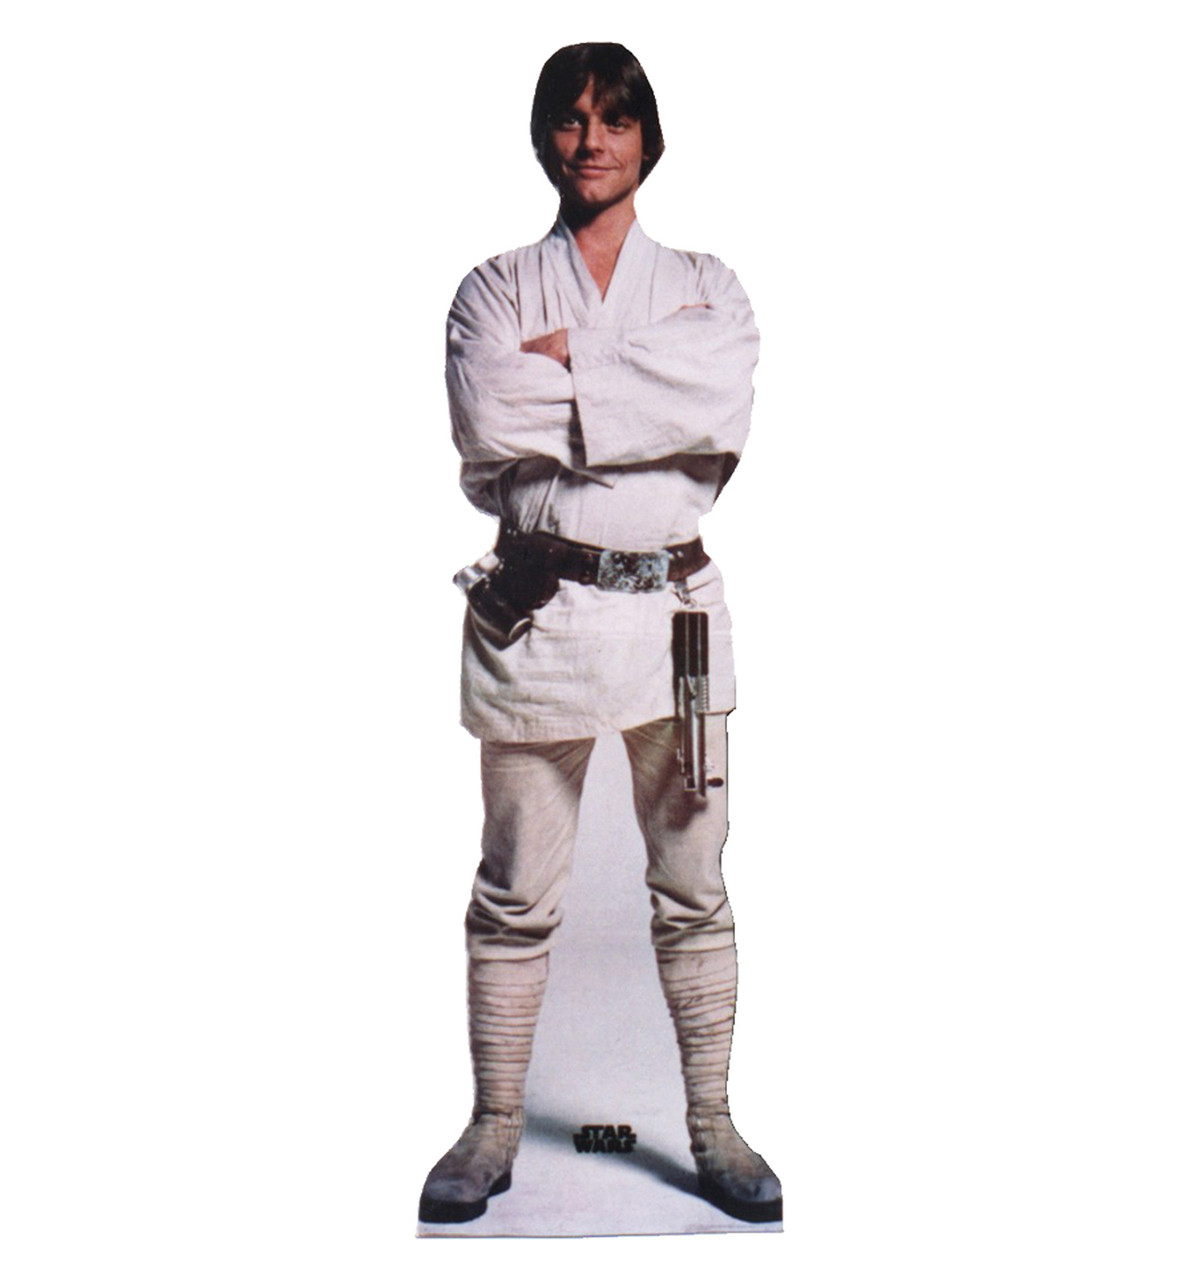 Luke Skywalker - Star Wars Classics- Cardboard Cutout 110